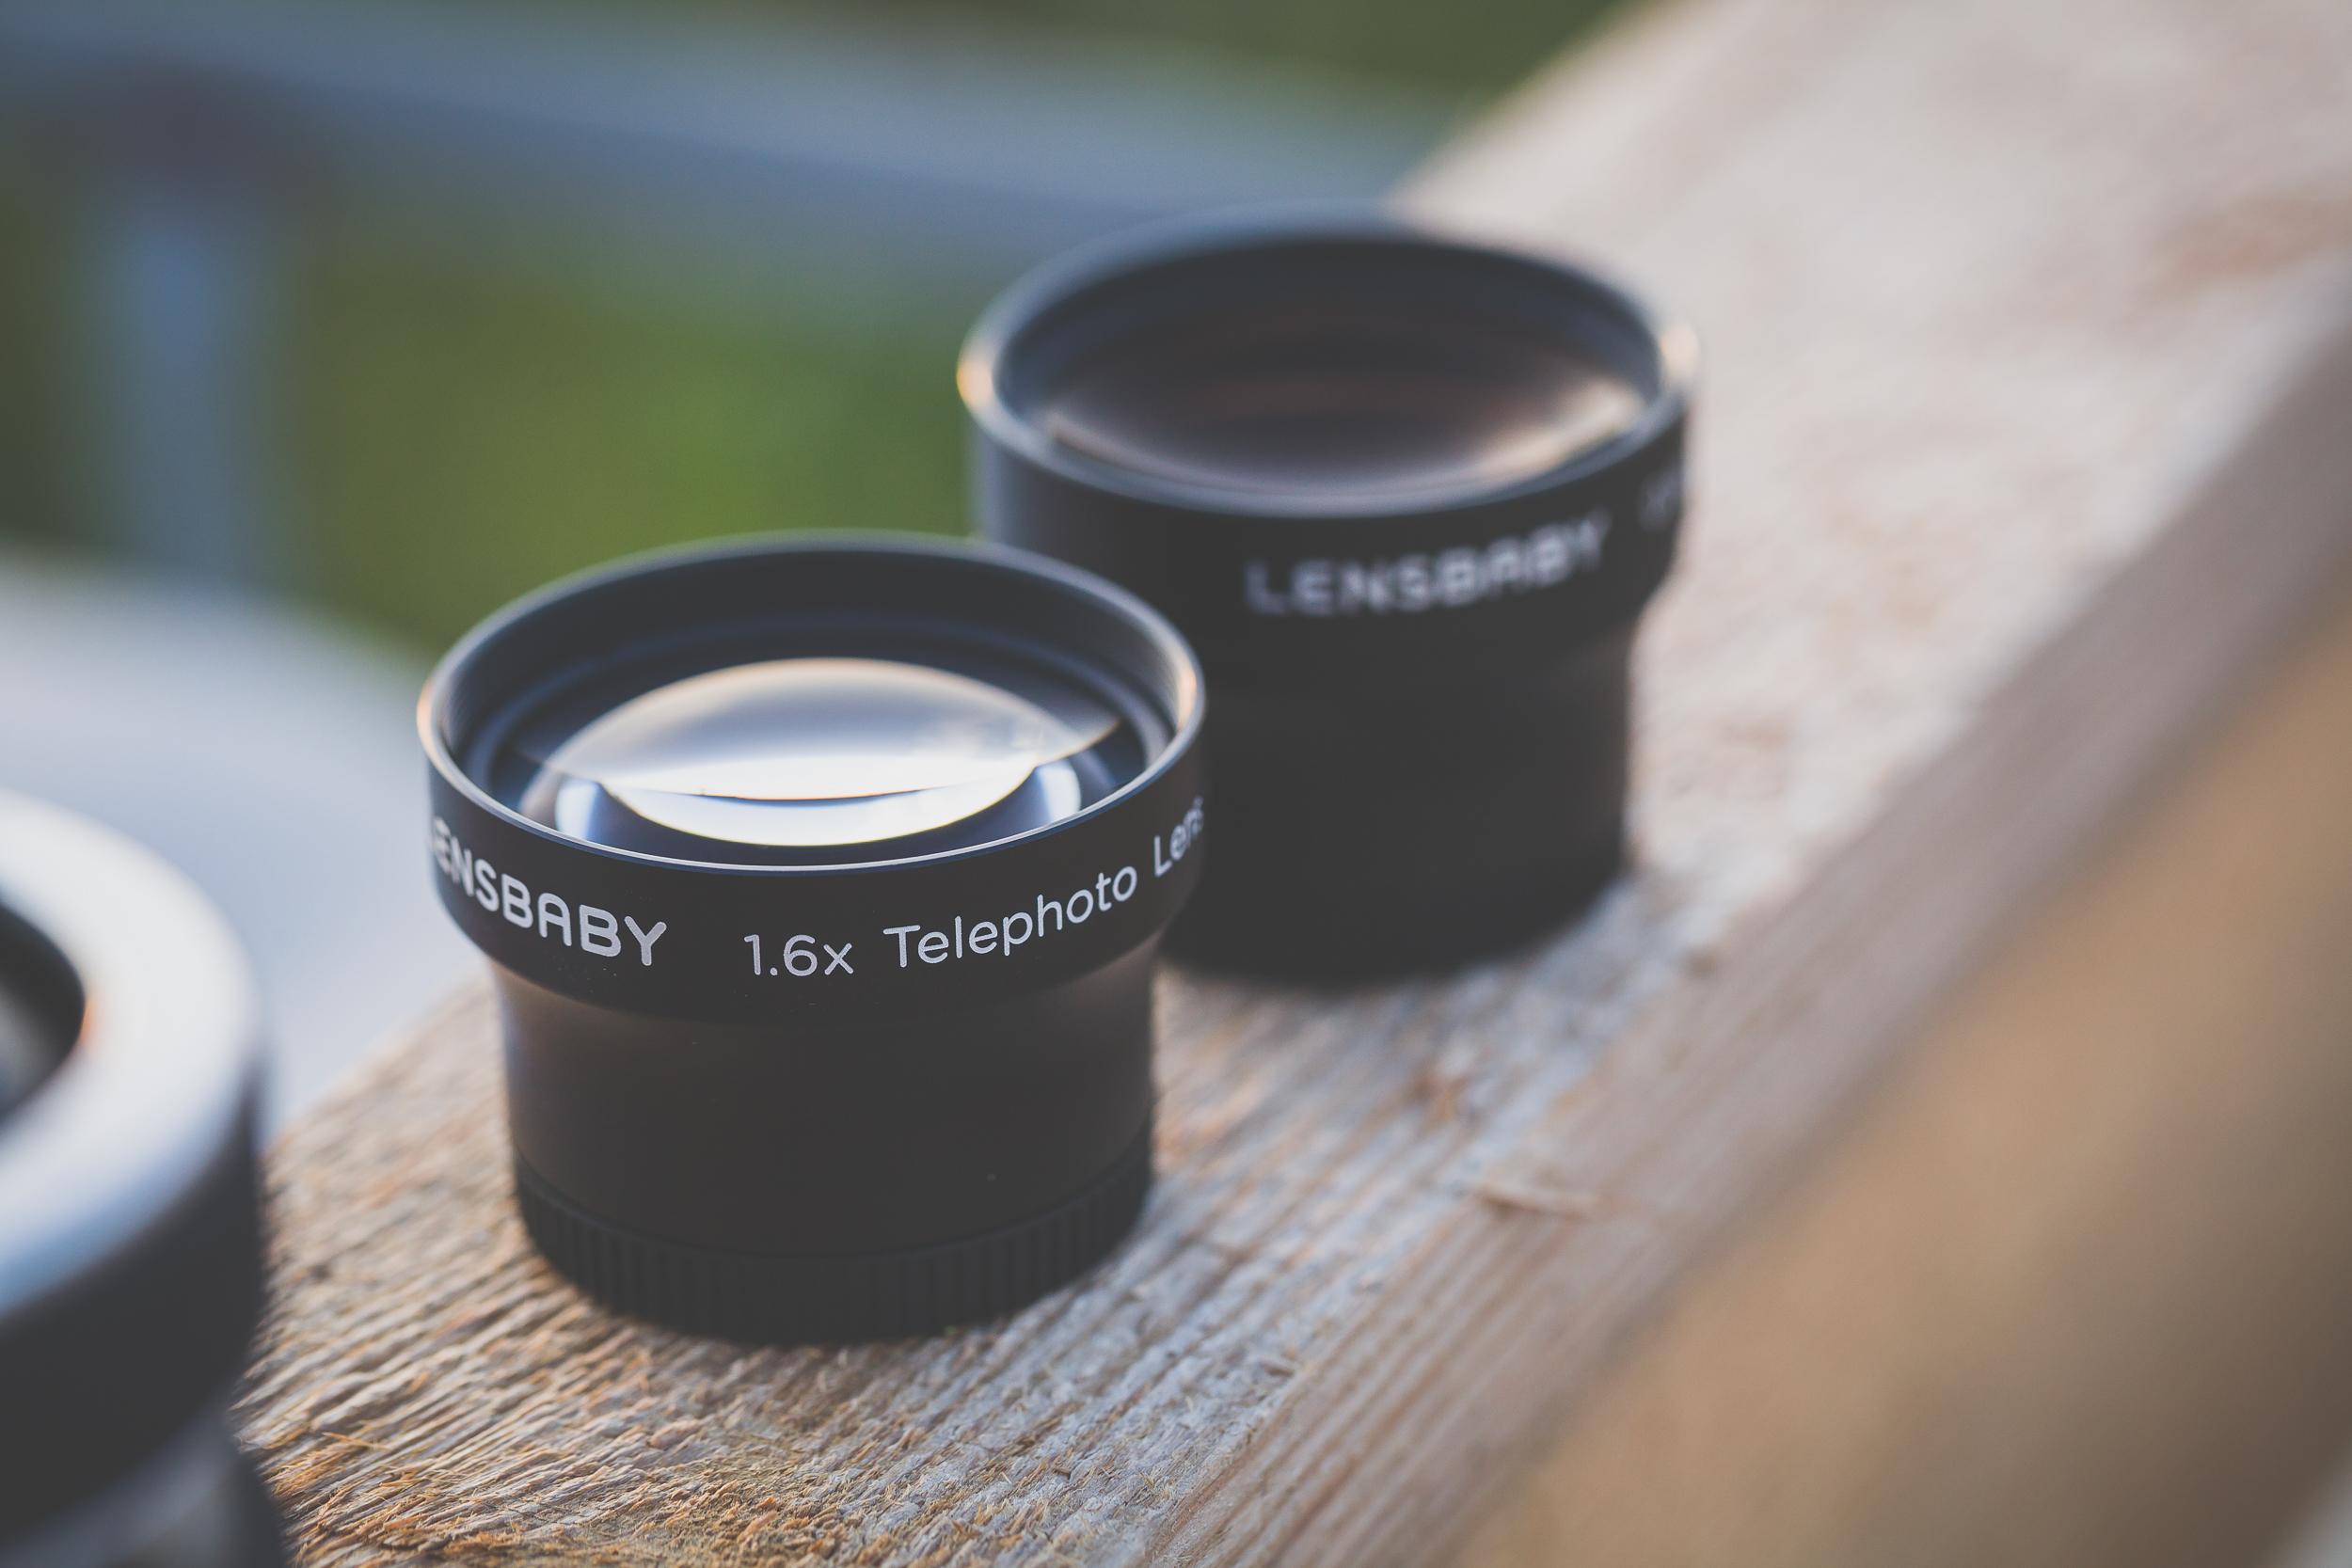 Lensbaby-Wiegelmann-140801-0010